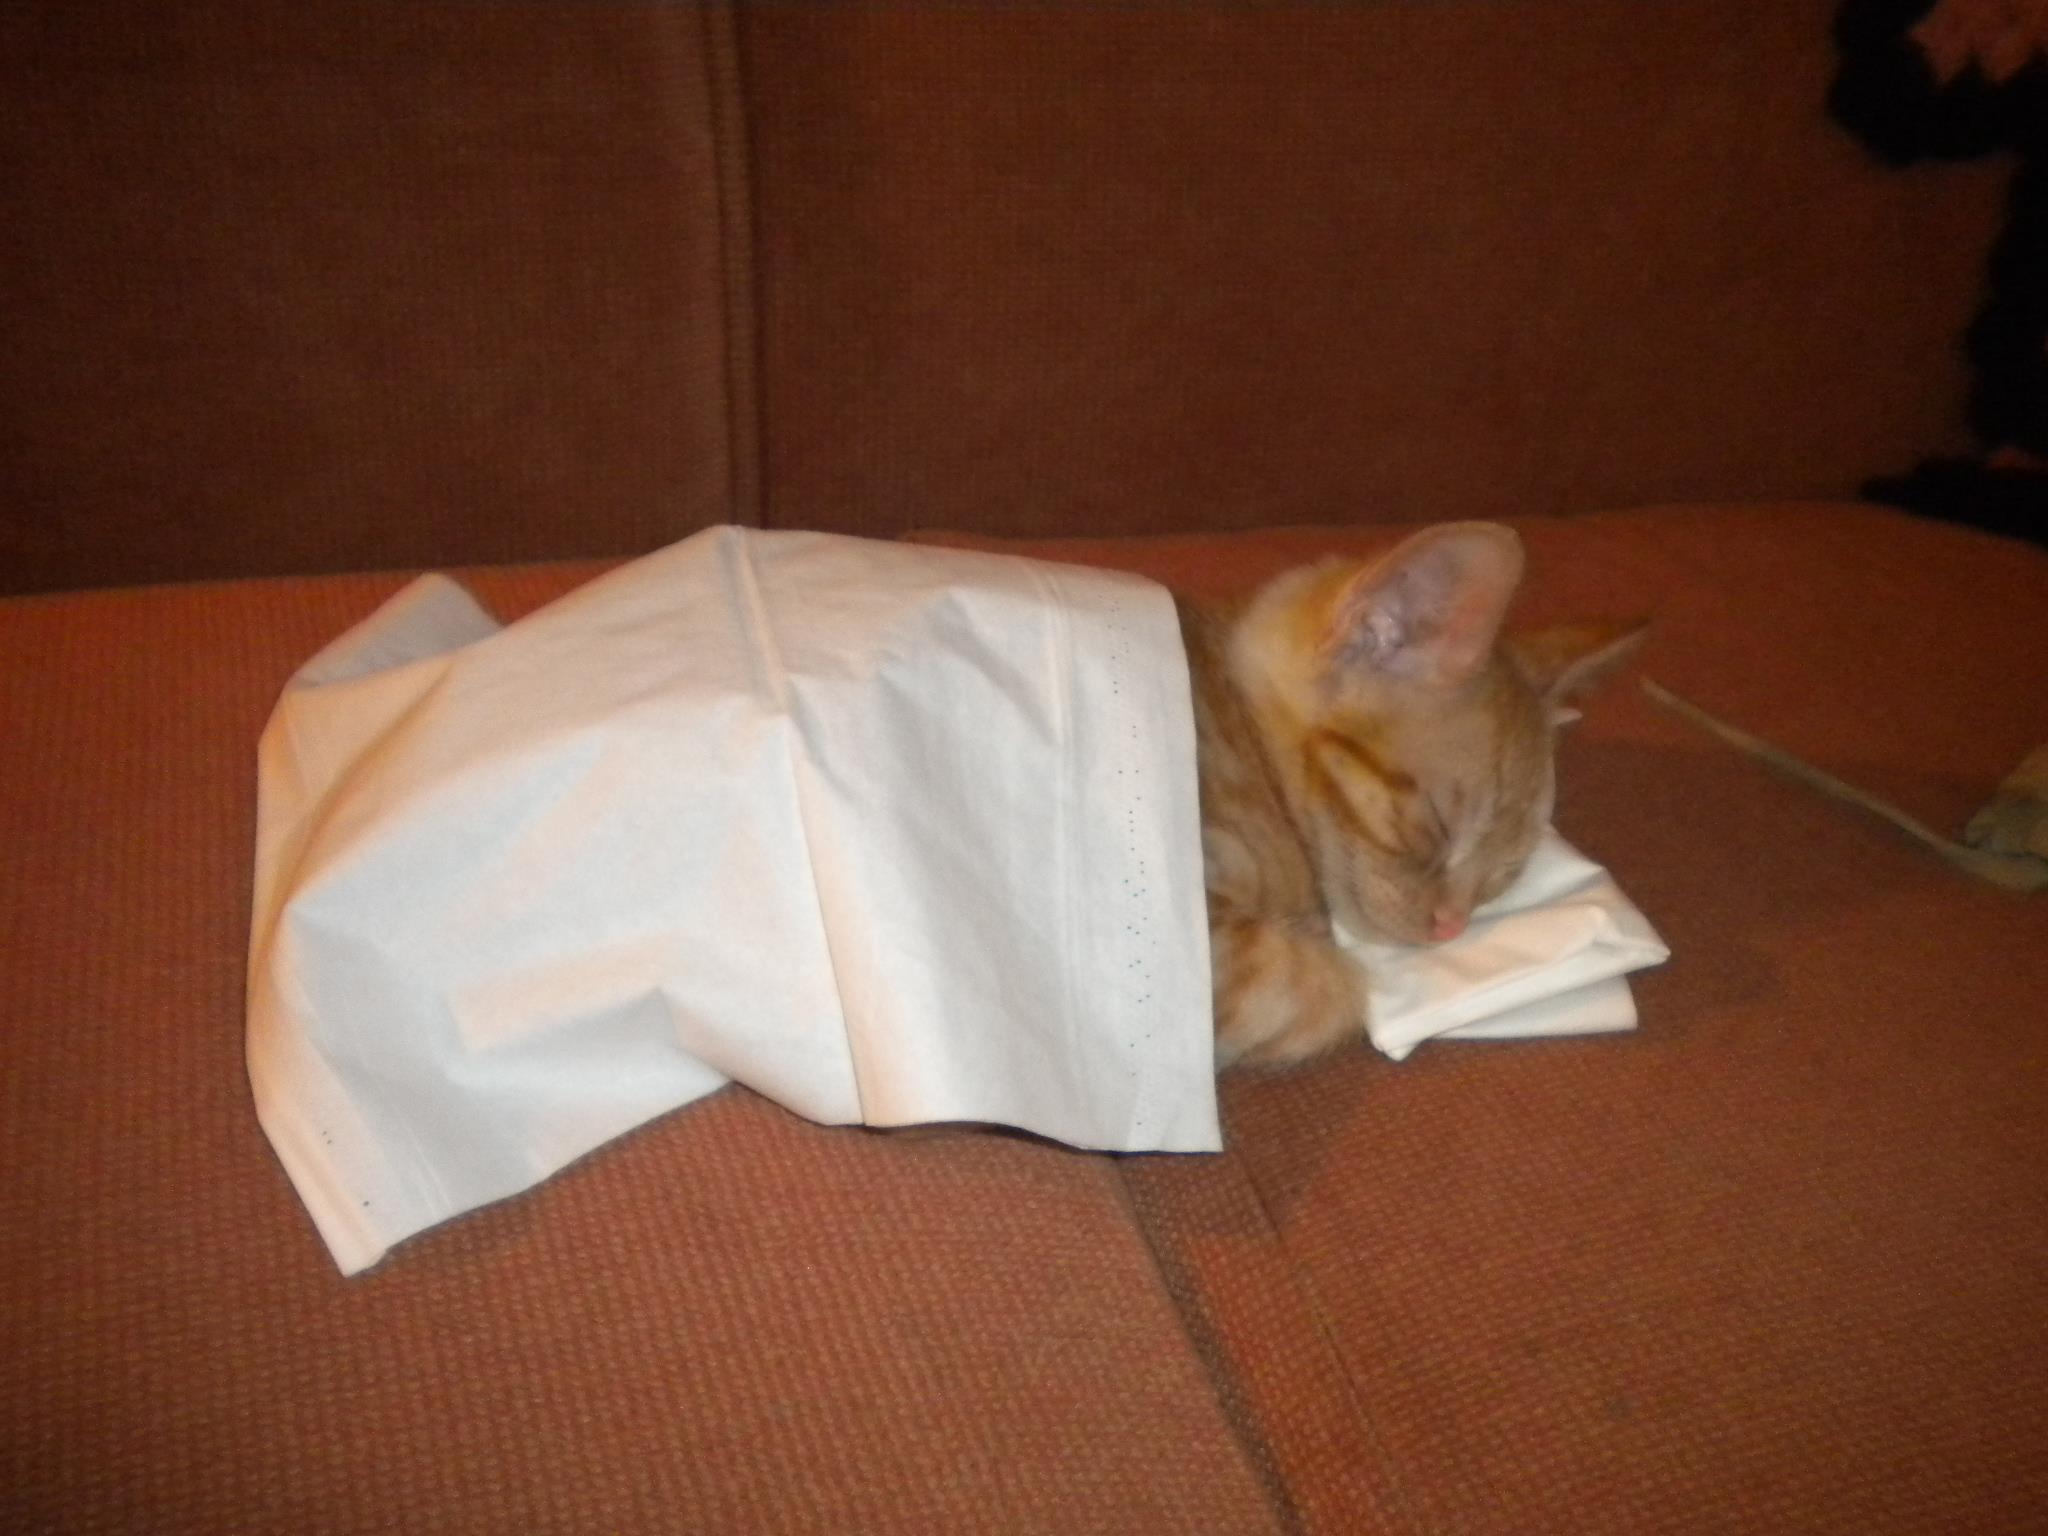 Фото спящей киски 9 фотография